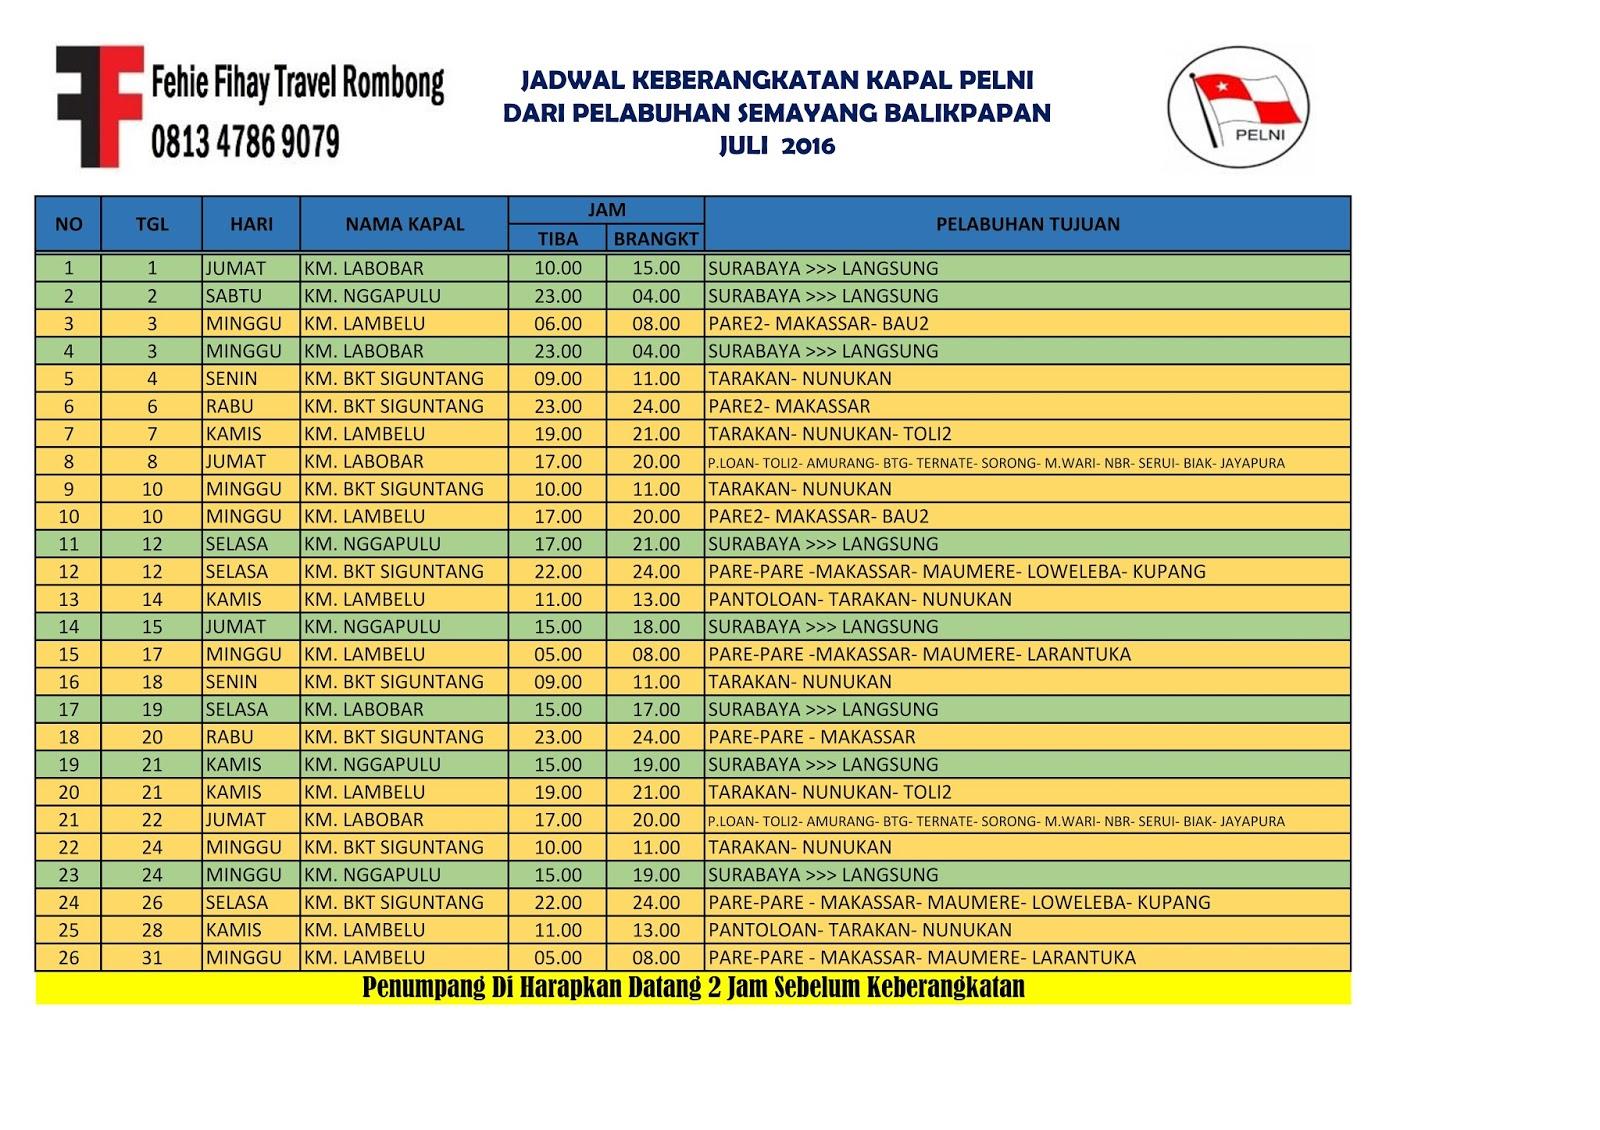 Jadwal Kapal Pelni Makassar Balikpapan Infotiket Com